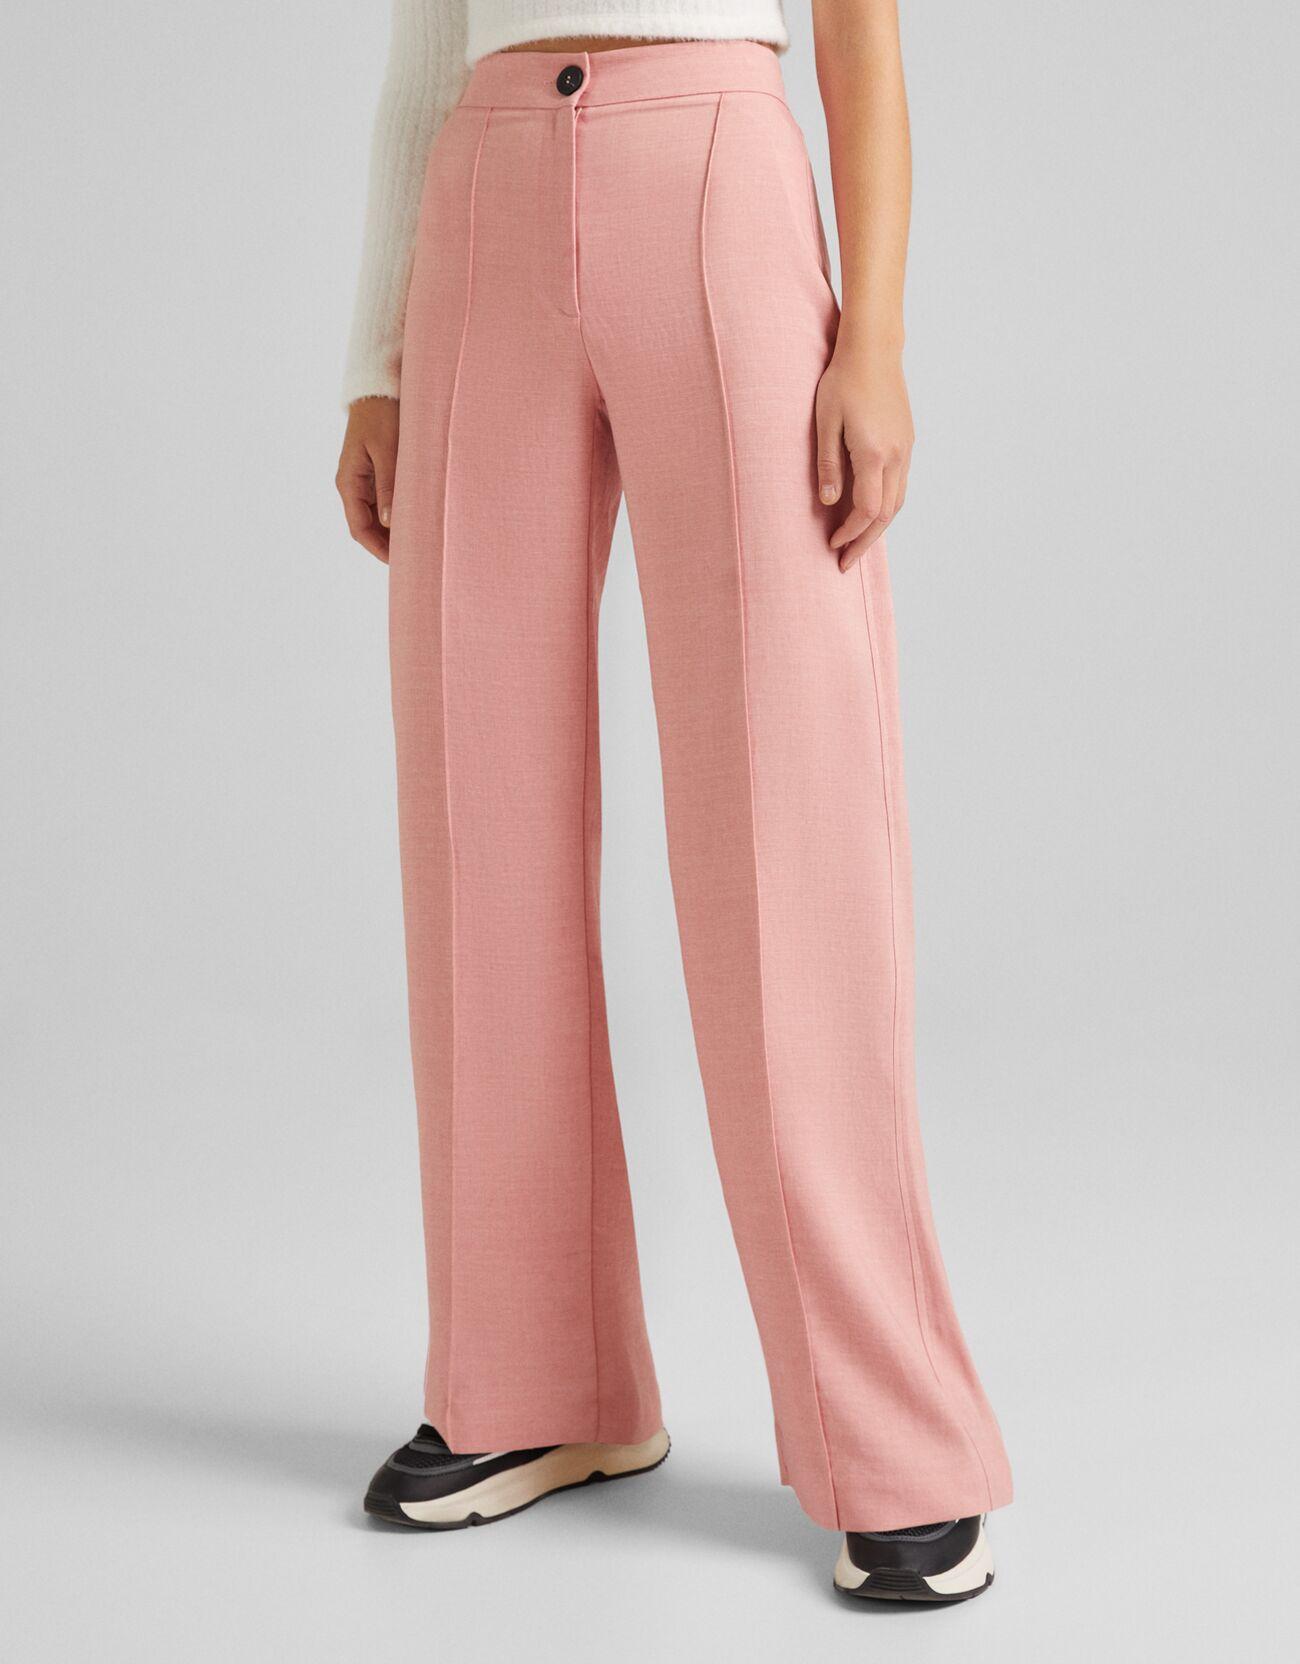 Розовый Брюки свободного кроя с широкими штанинами Bershka